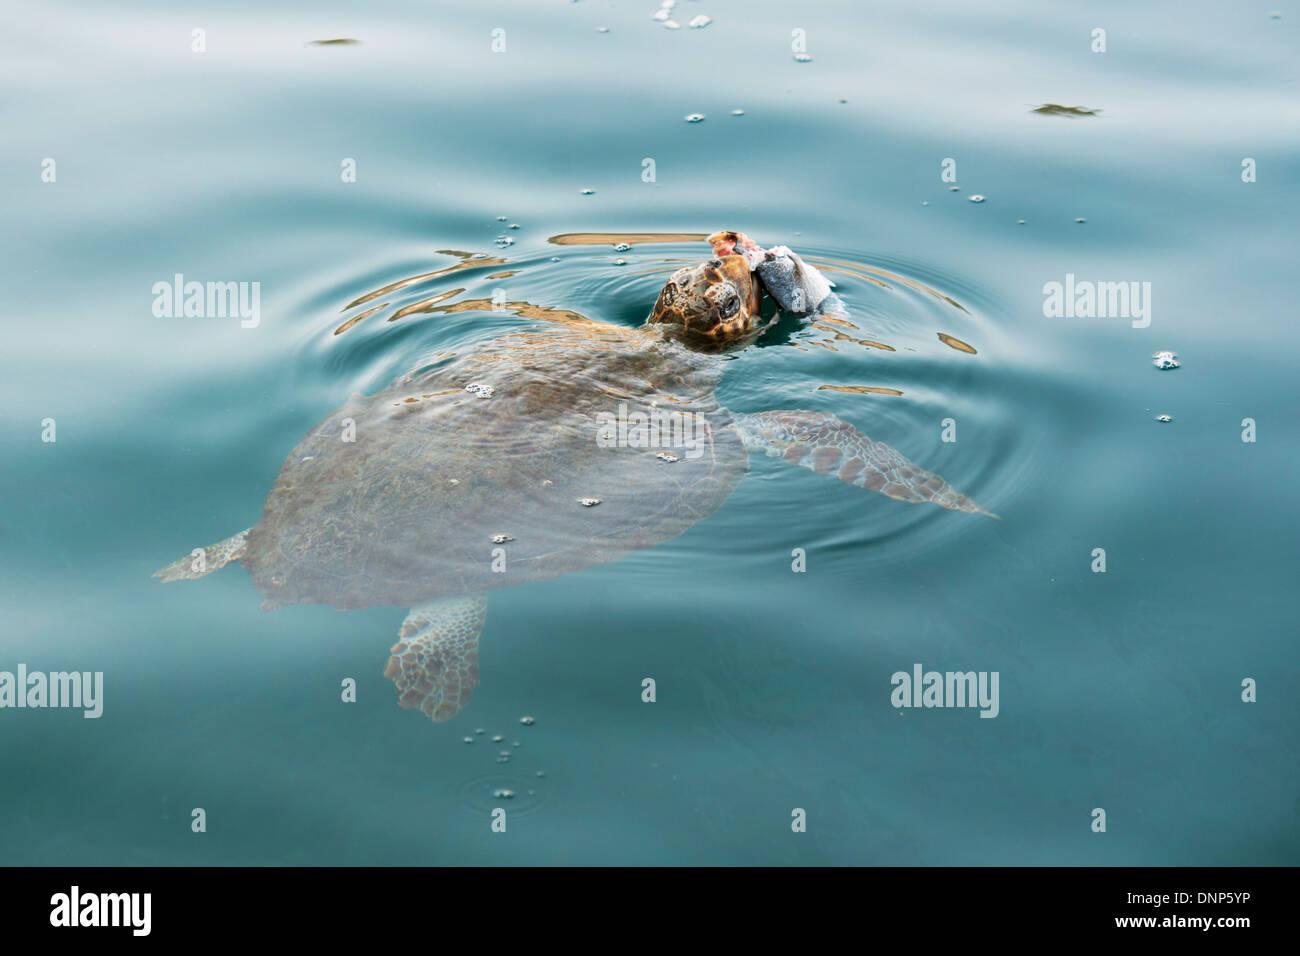 Griechenland, Kastellorizo, Wasserschildkröte Caretta Caretta - Stock Image